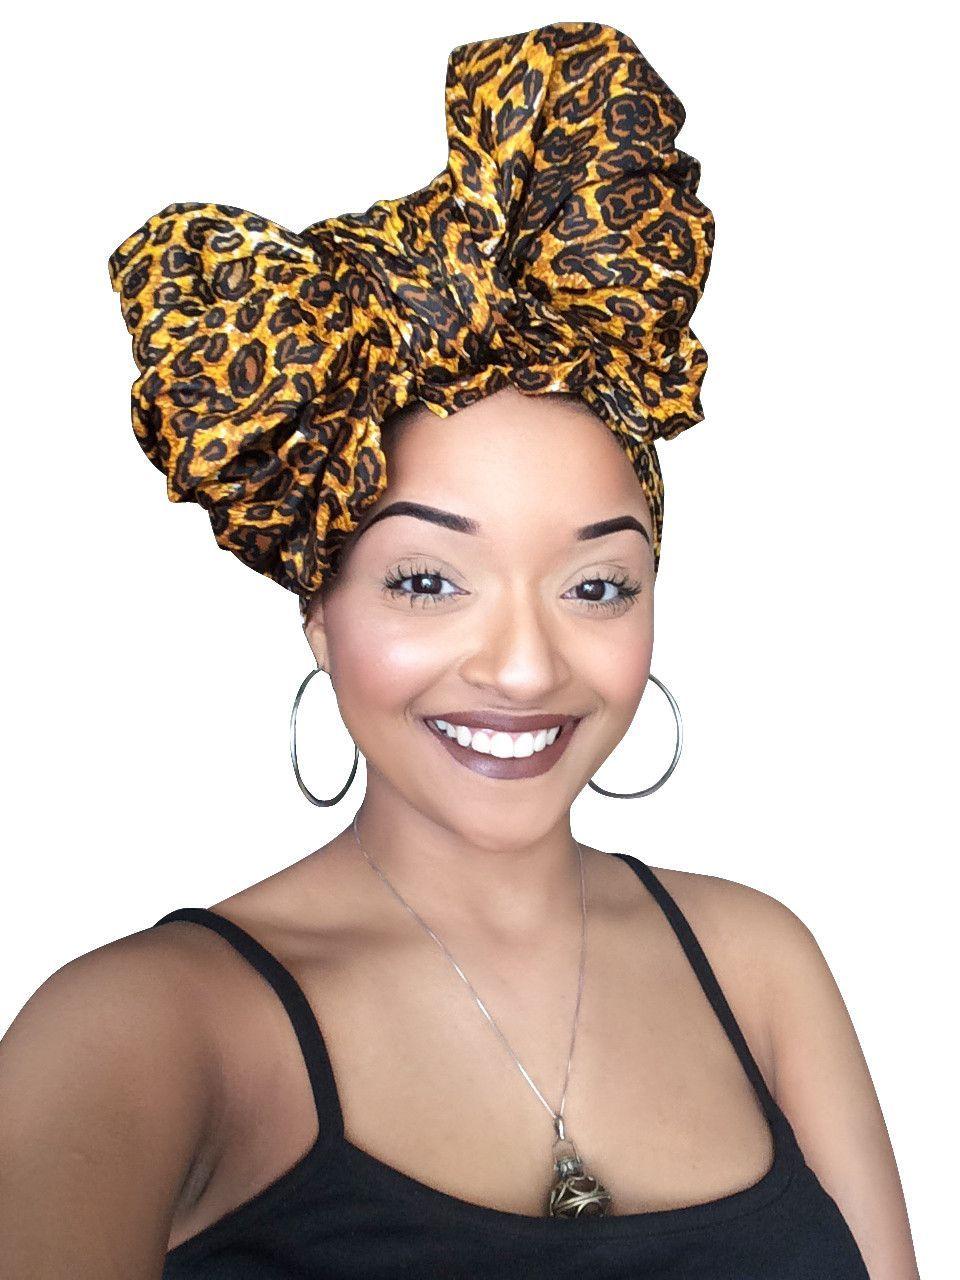 Empress head wrap hair styles braided hairstyles side